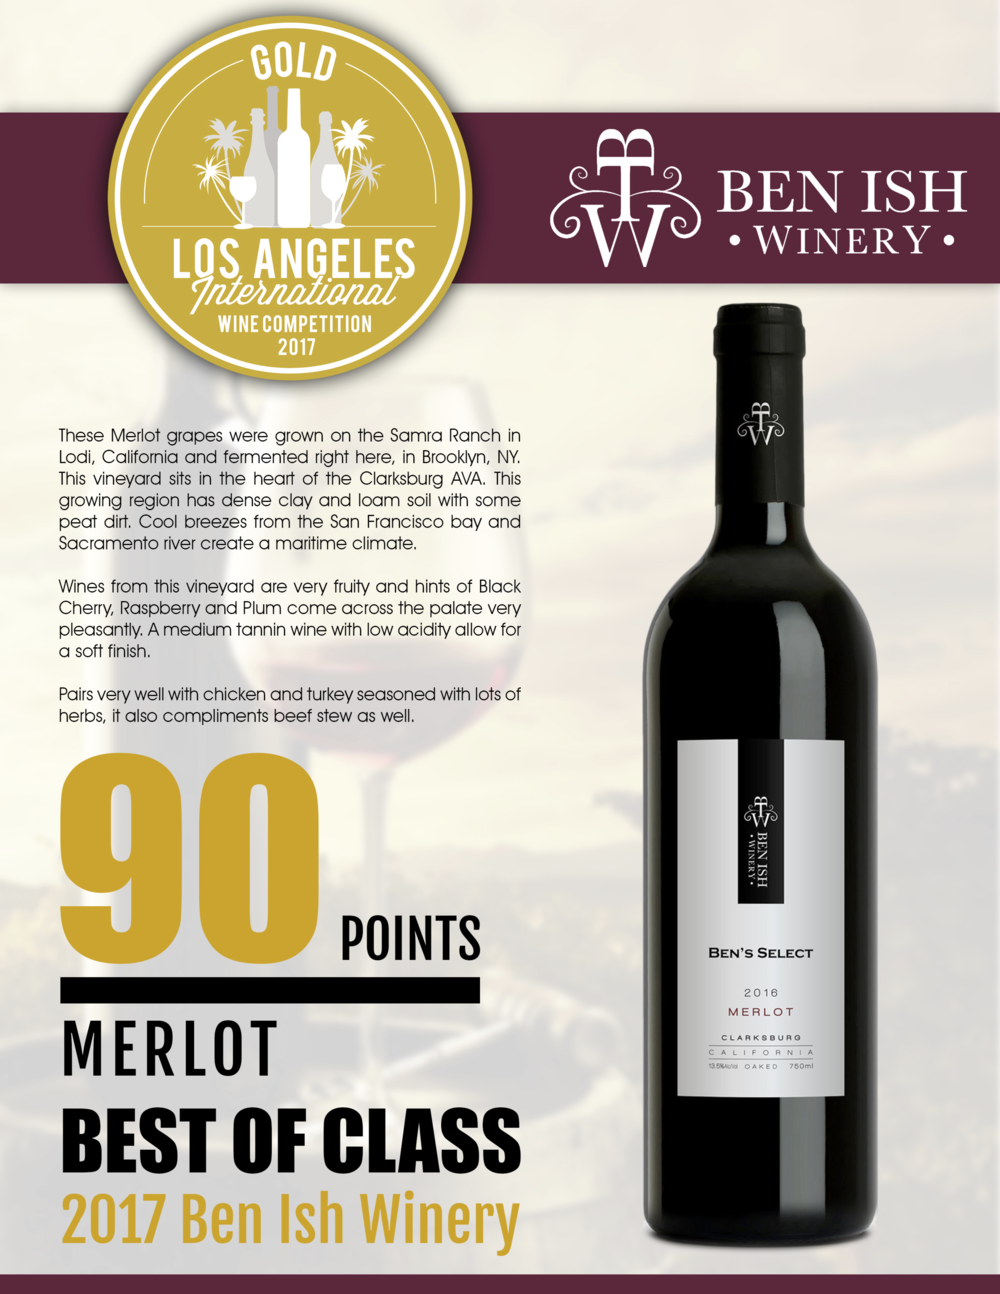 Los Angeles International Wine Competition - 2017 - GOLD medal -2016 Merlot